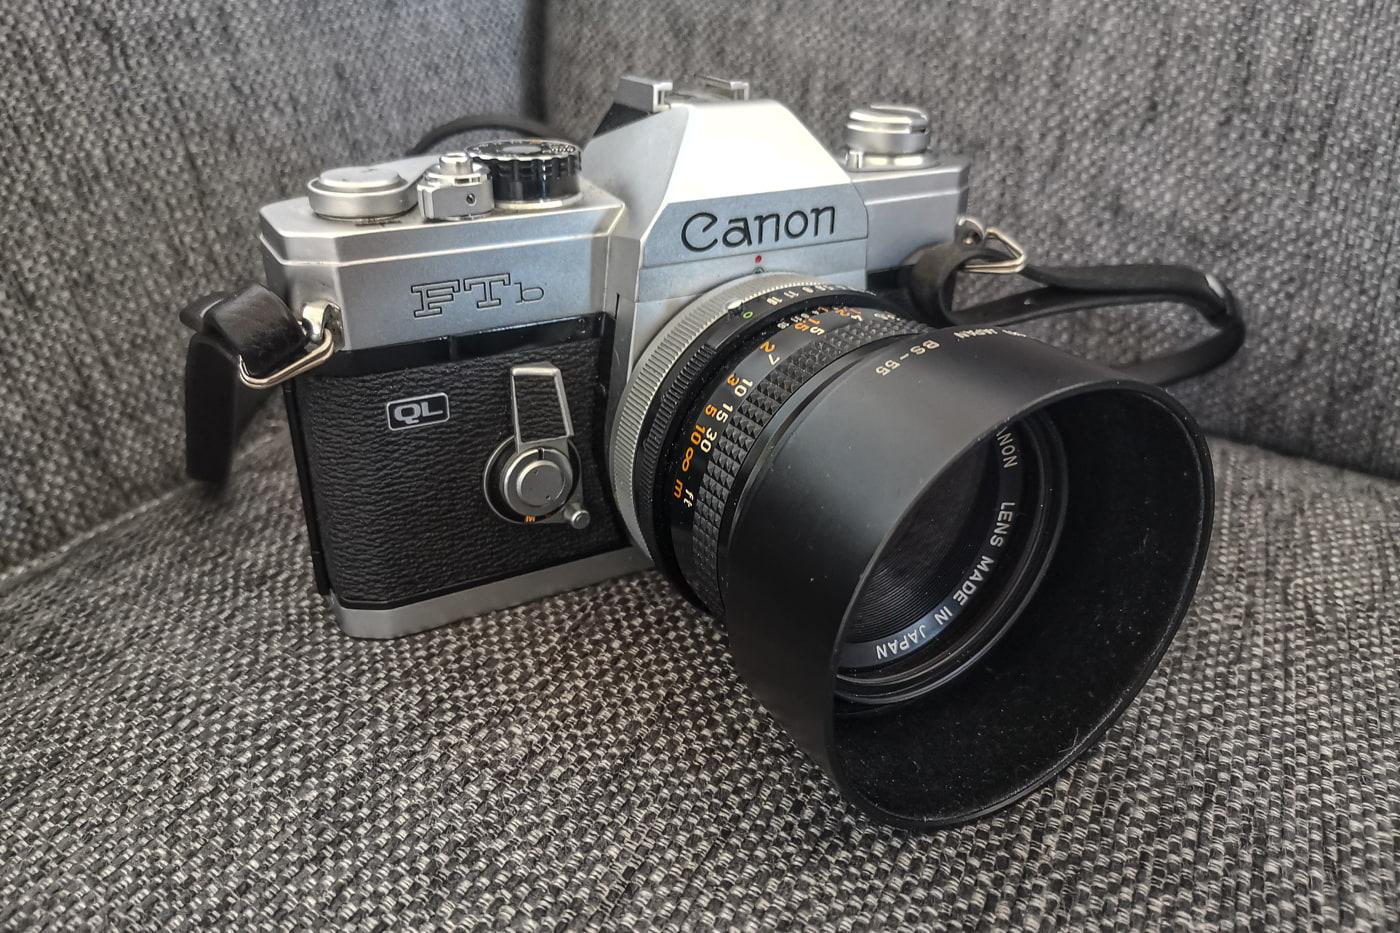 analoge Spiegelreflexkamera Canon FTb